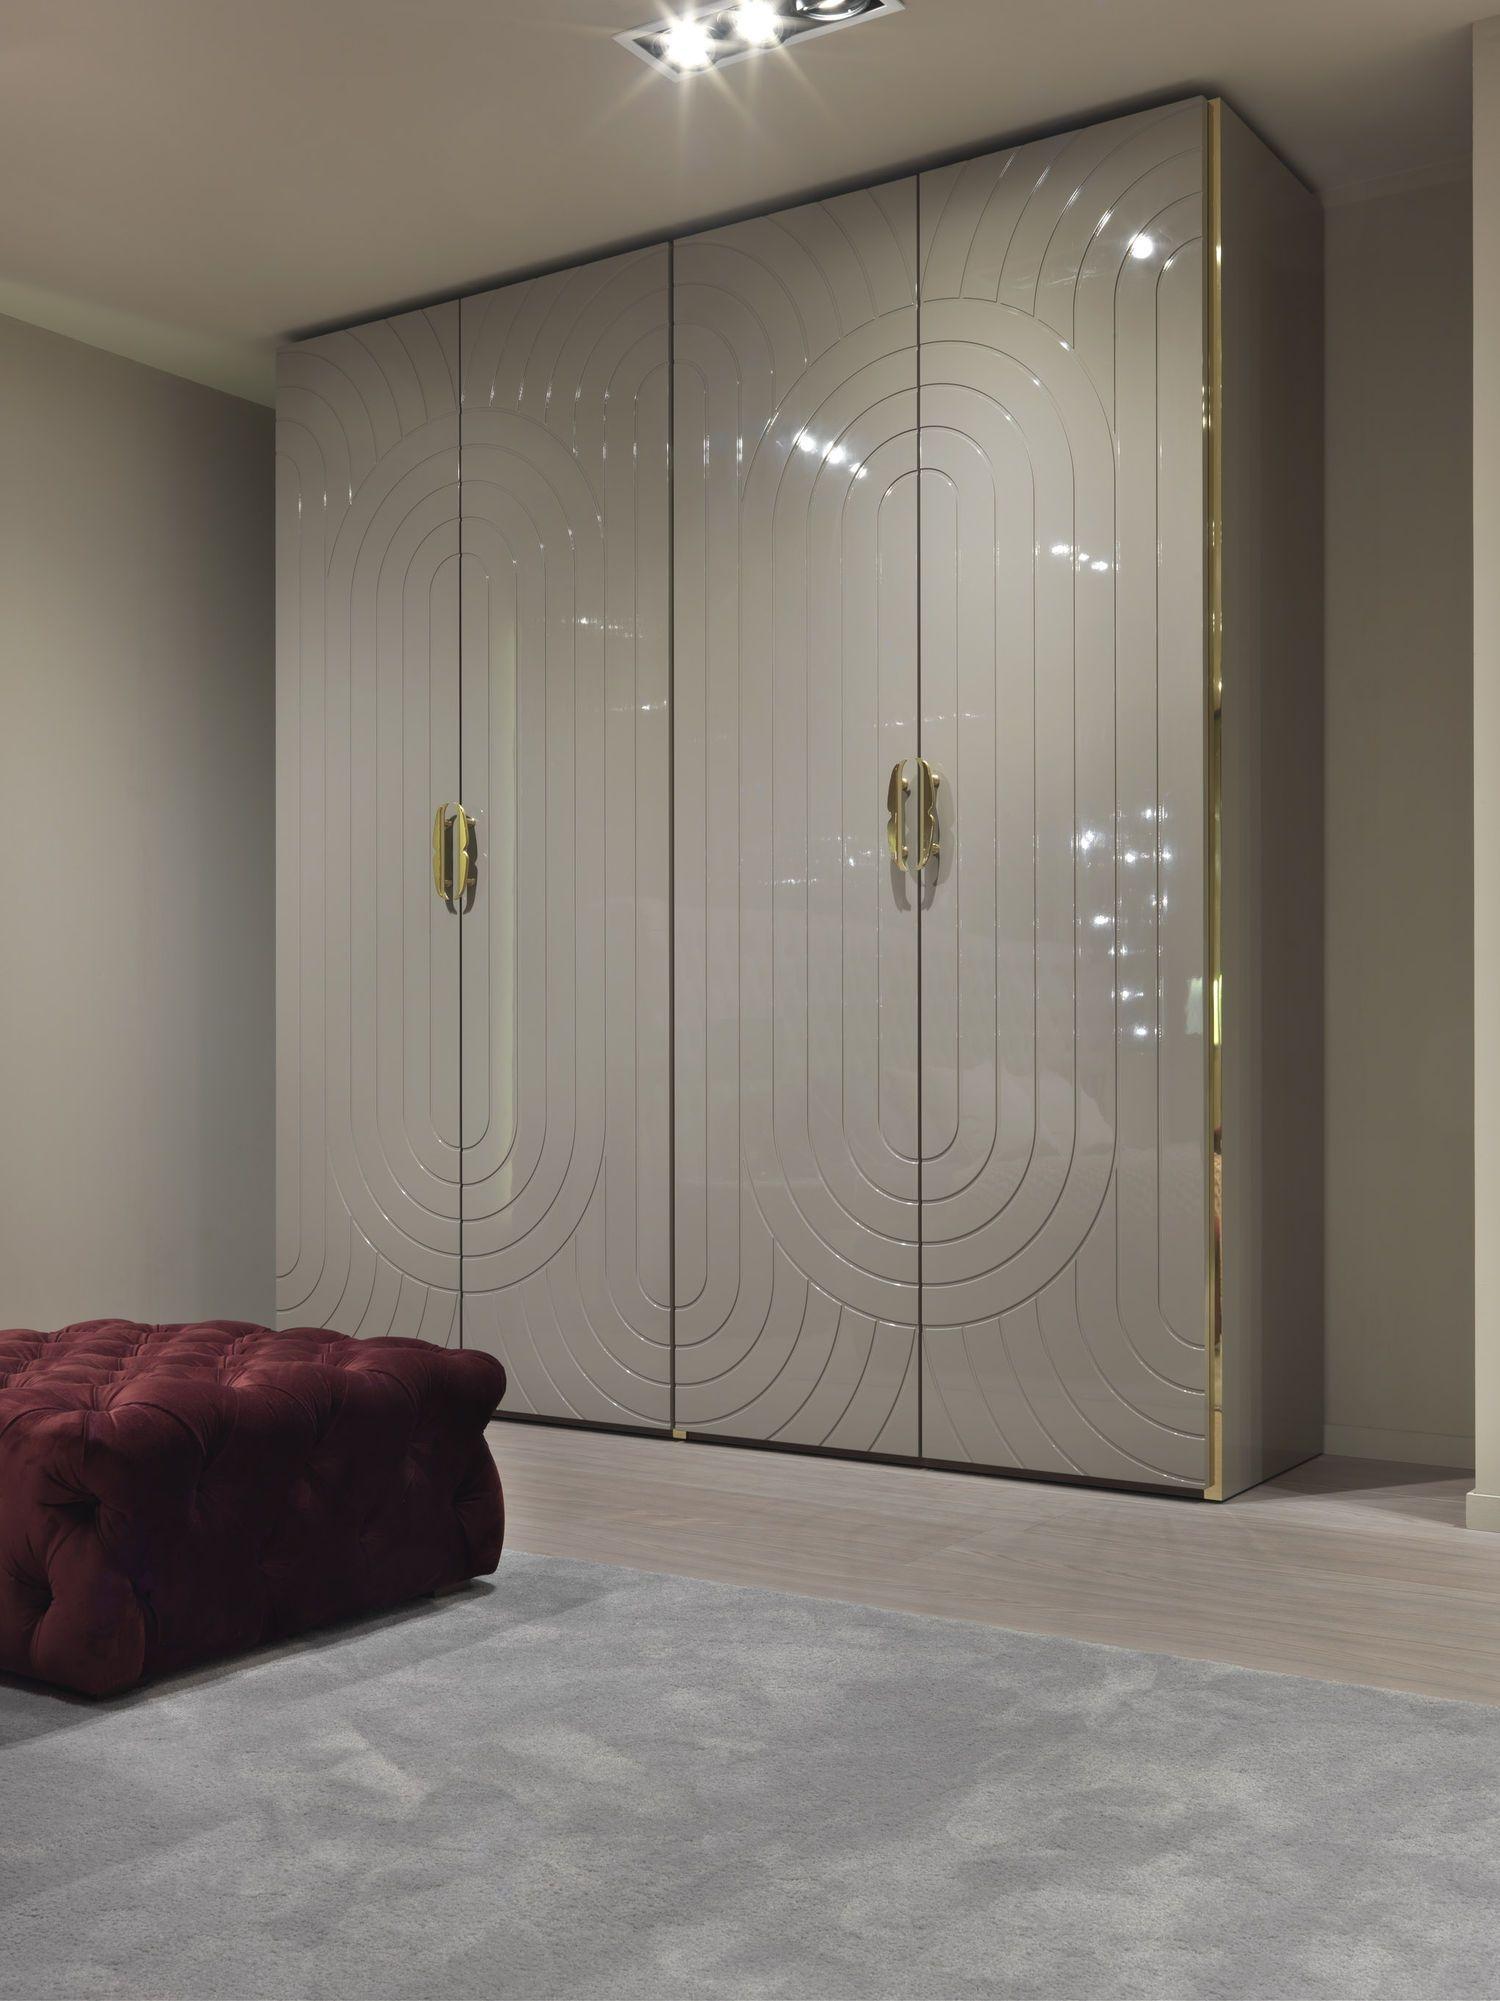 Creative Bedroom Wardrobe Design Ideas That Inspire On18